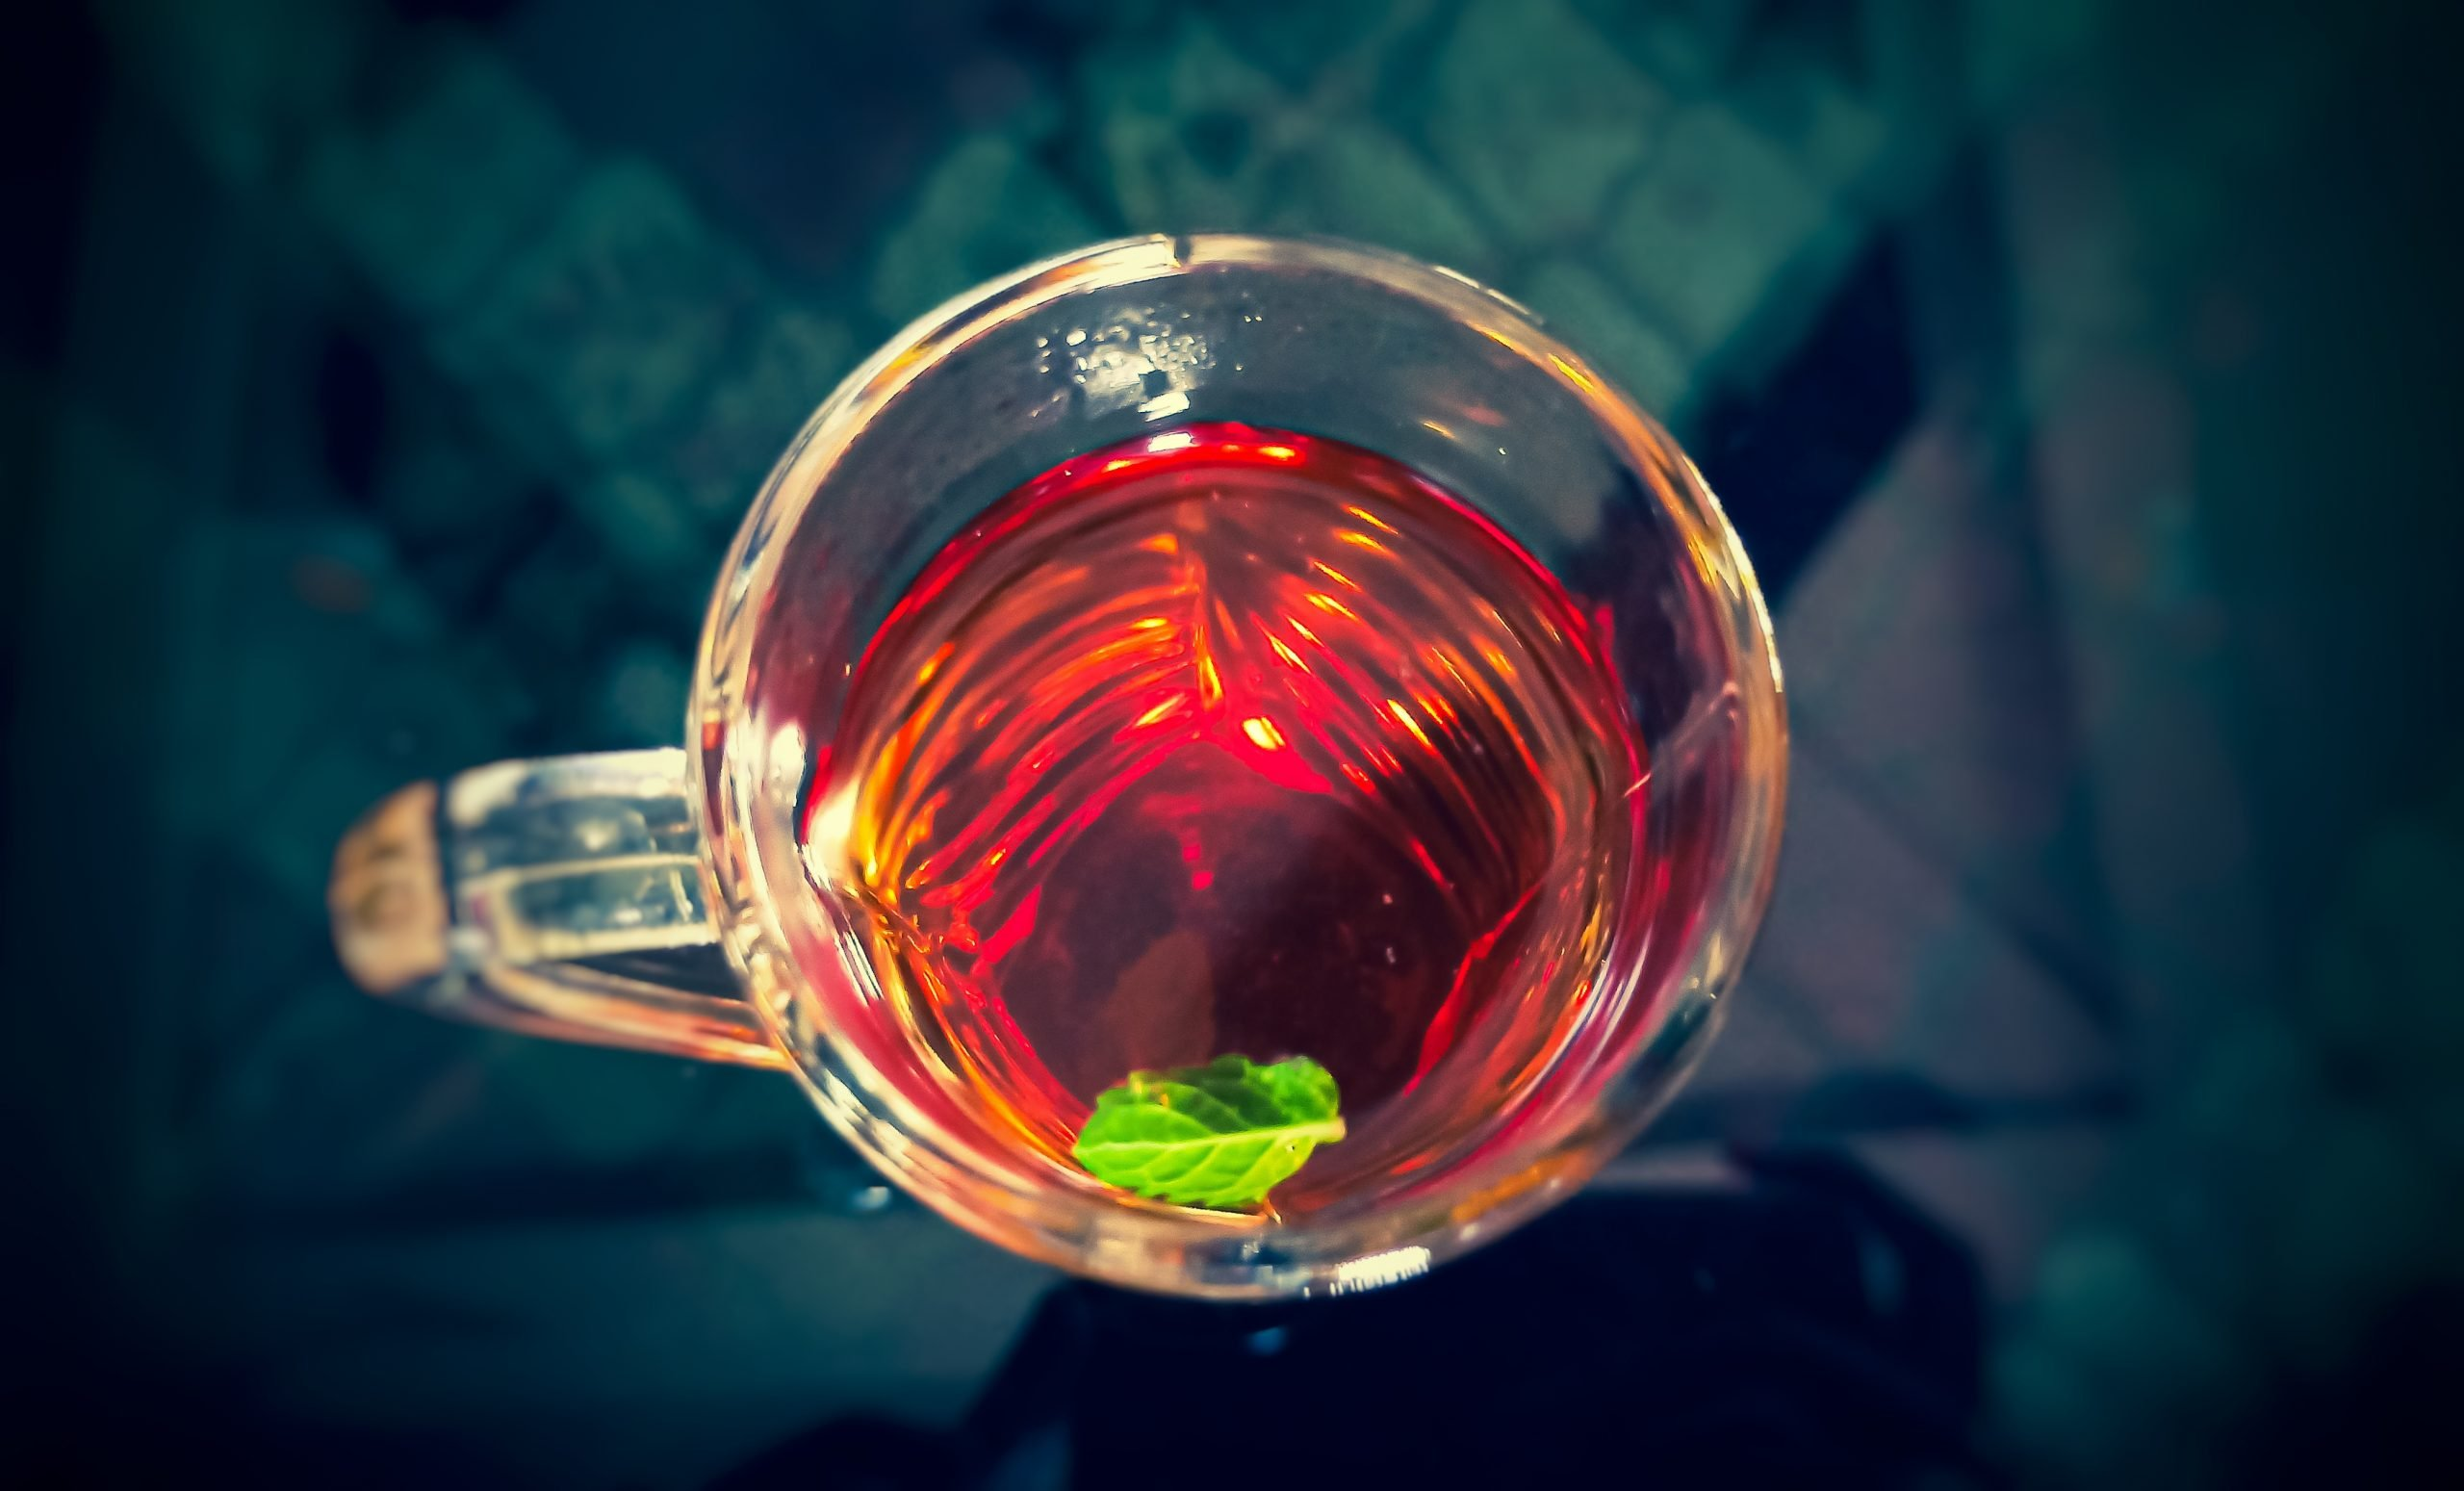 A lemon tea cup